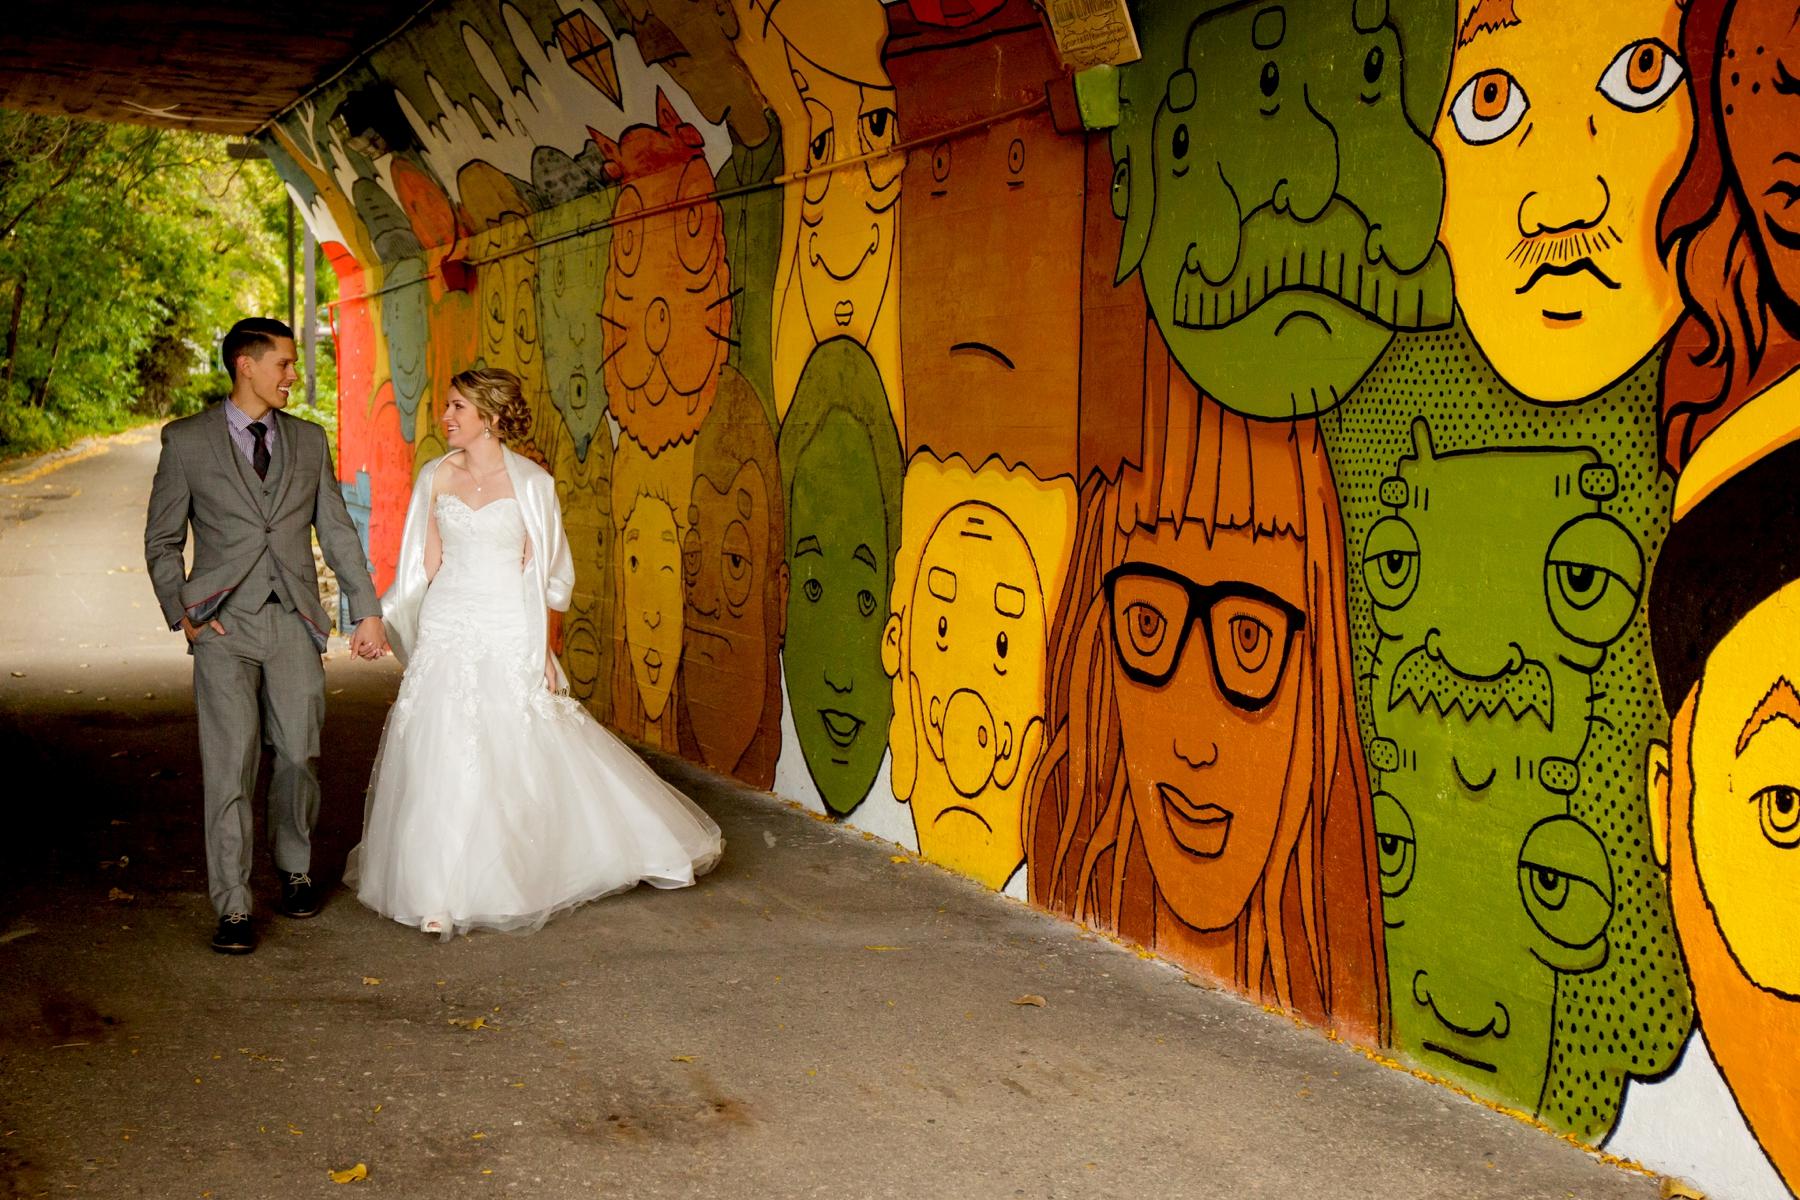 Brandon_Shafer_Photography_Kristen_Corey_Downtown_Grand_Rapids_Fall_Wedding0022.JPG